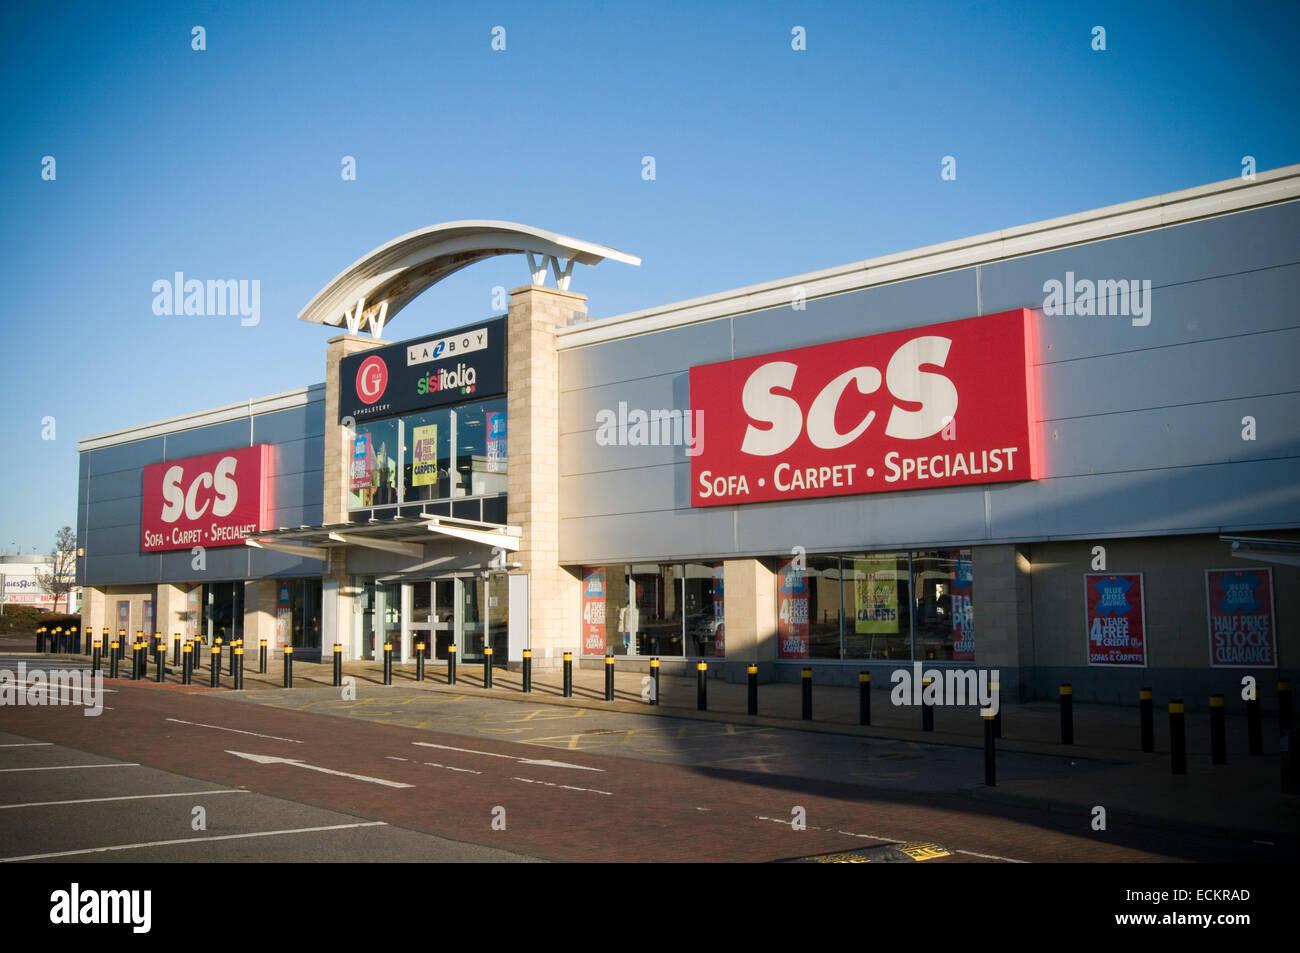 Scs Store Stock Photos Scs Store Stock Images Alamy